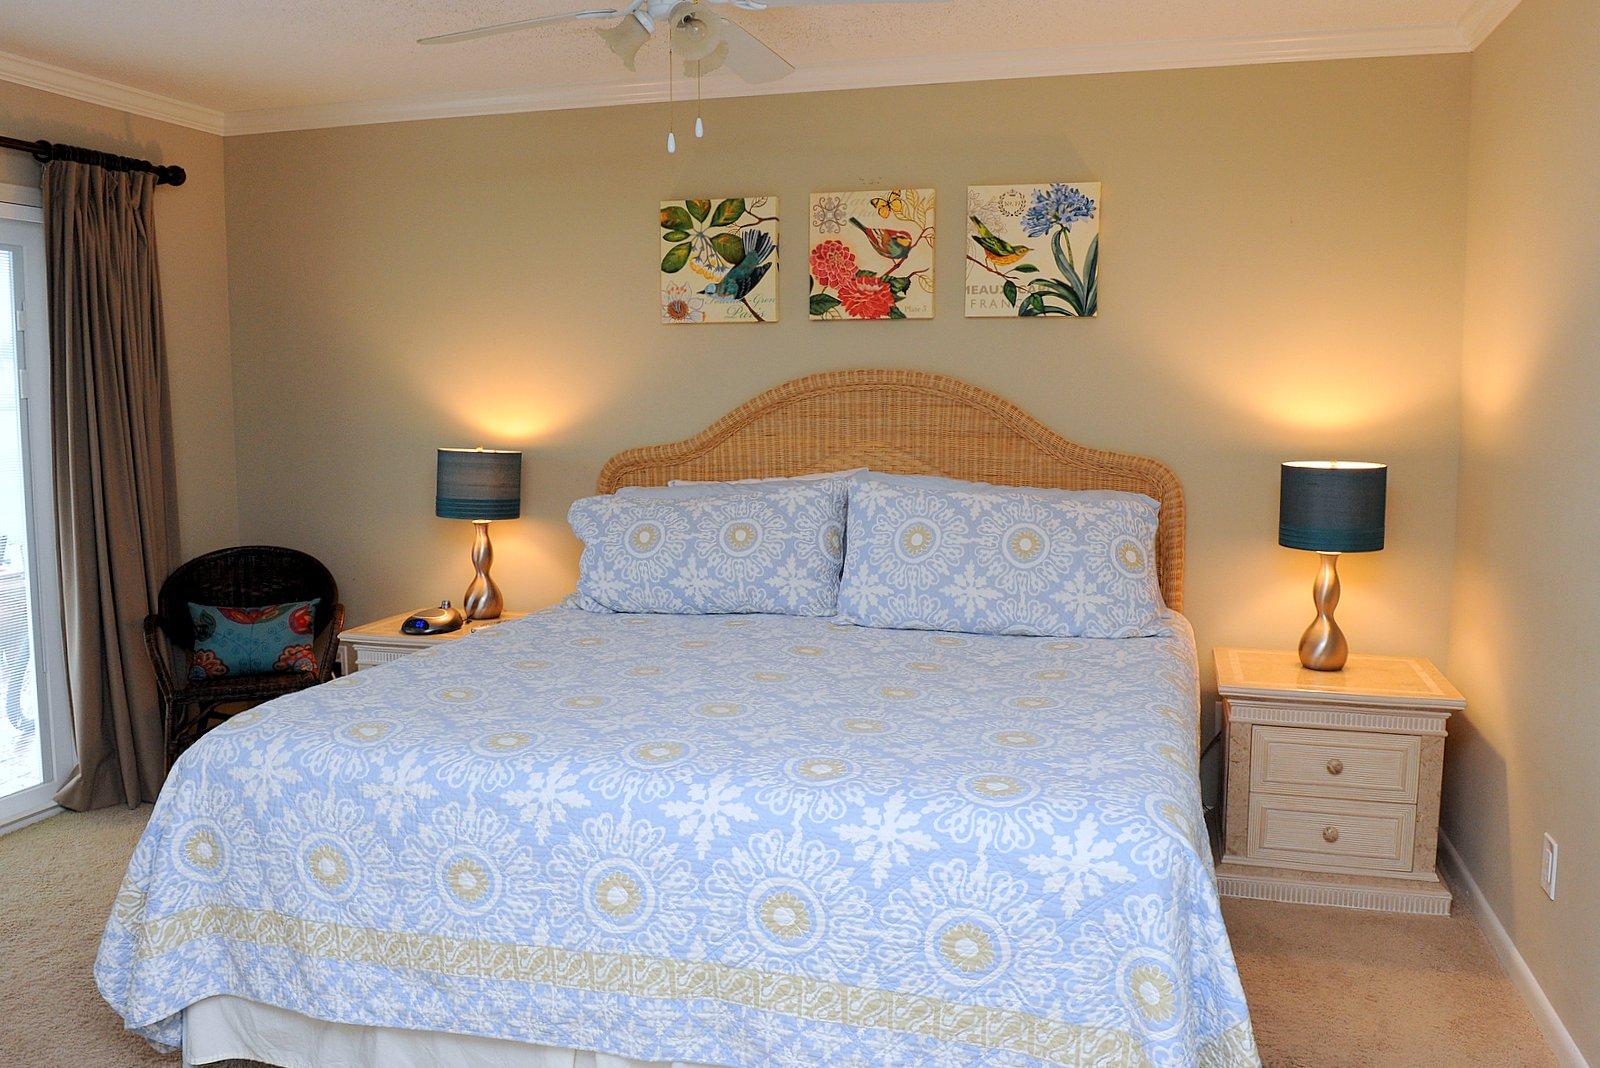 428 Linkside Condo rental in Sandestin Rentals ~ Cottages and Villas  in Destin Florida - #13